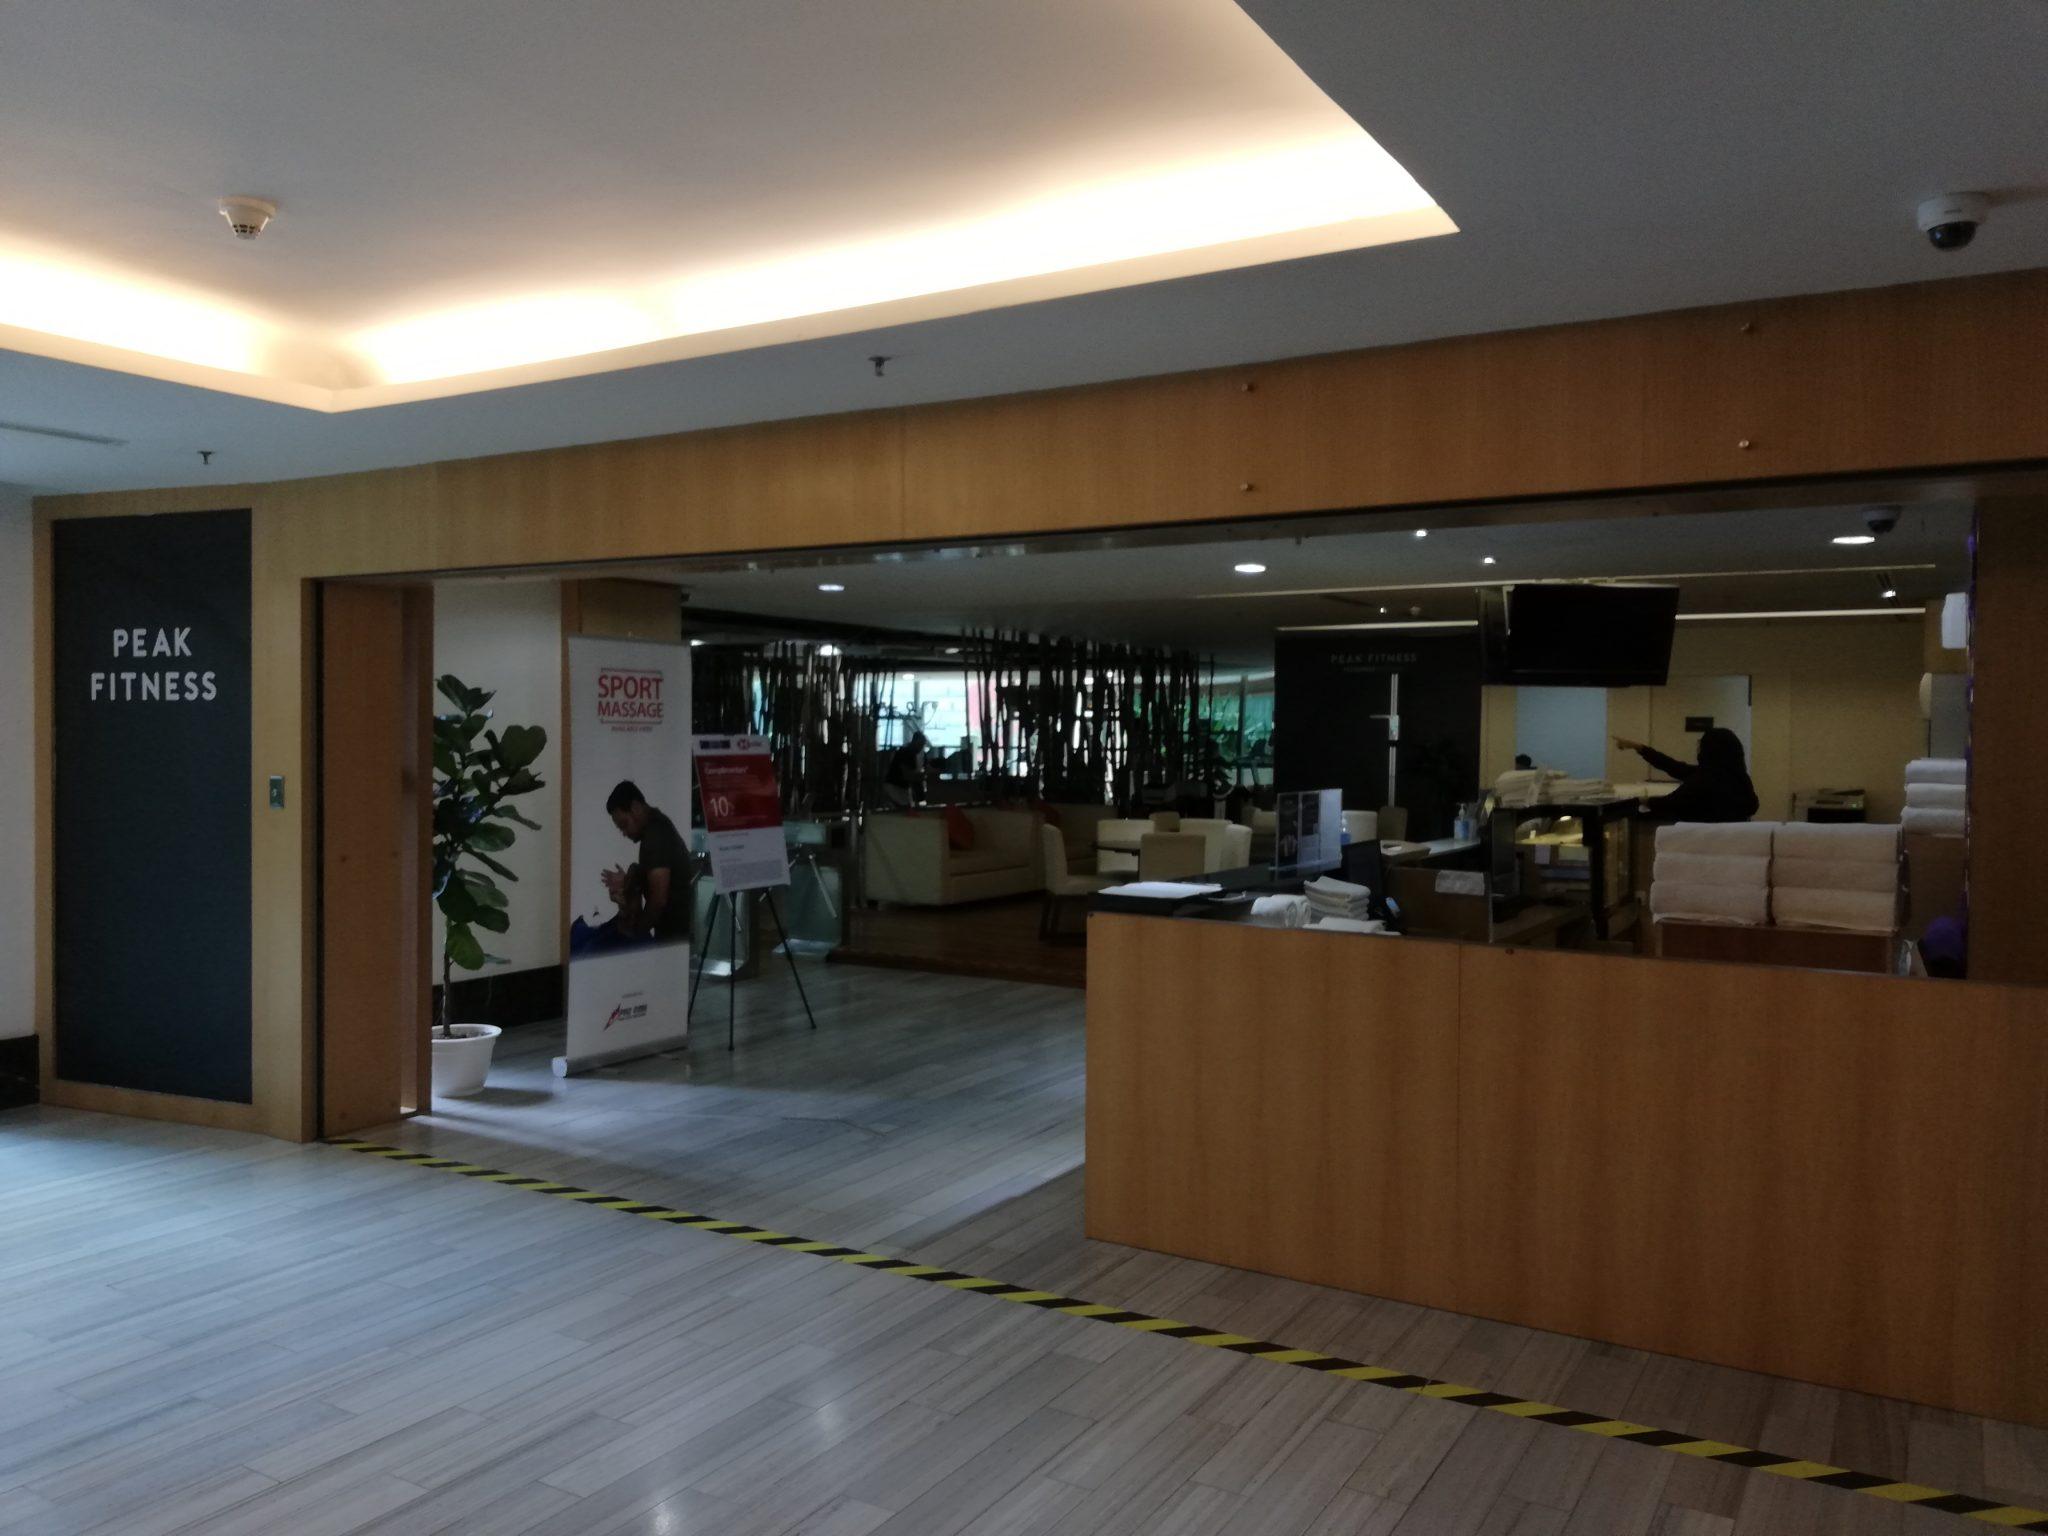 Peak Fitness G Tower, Kuala Lumpur